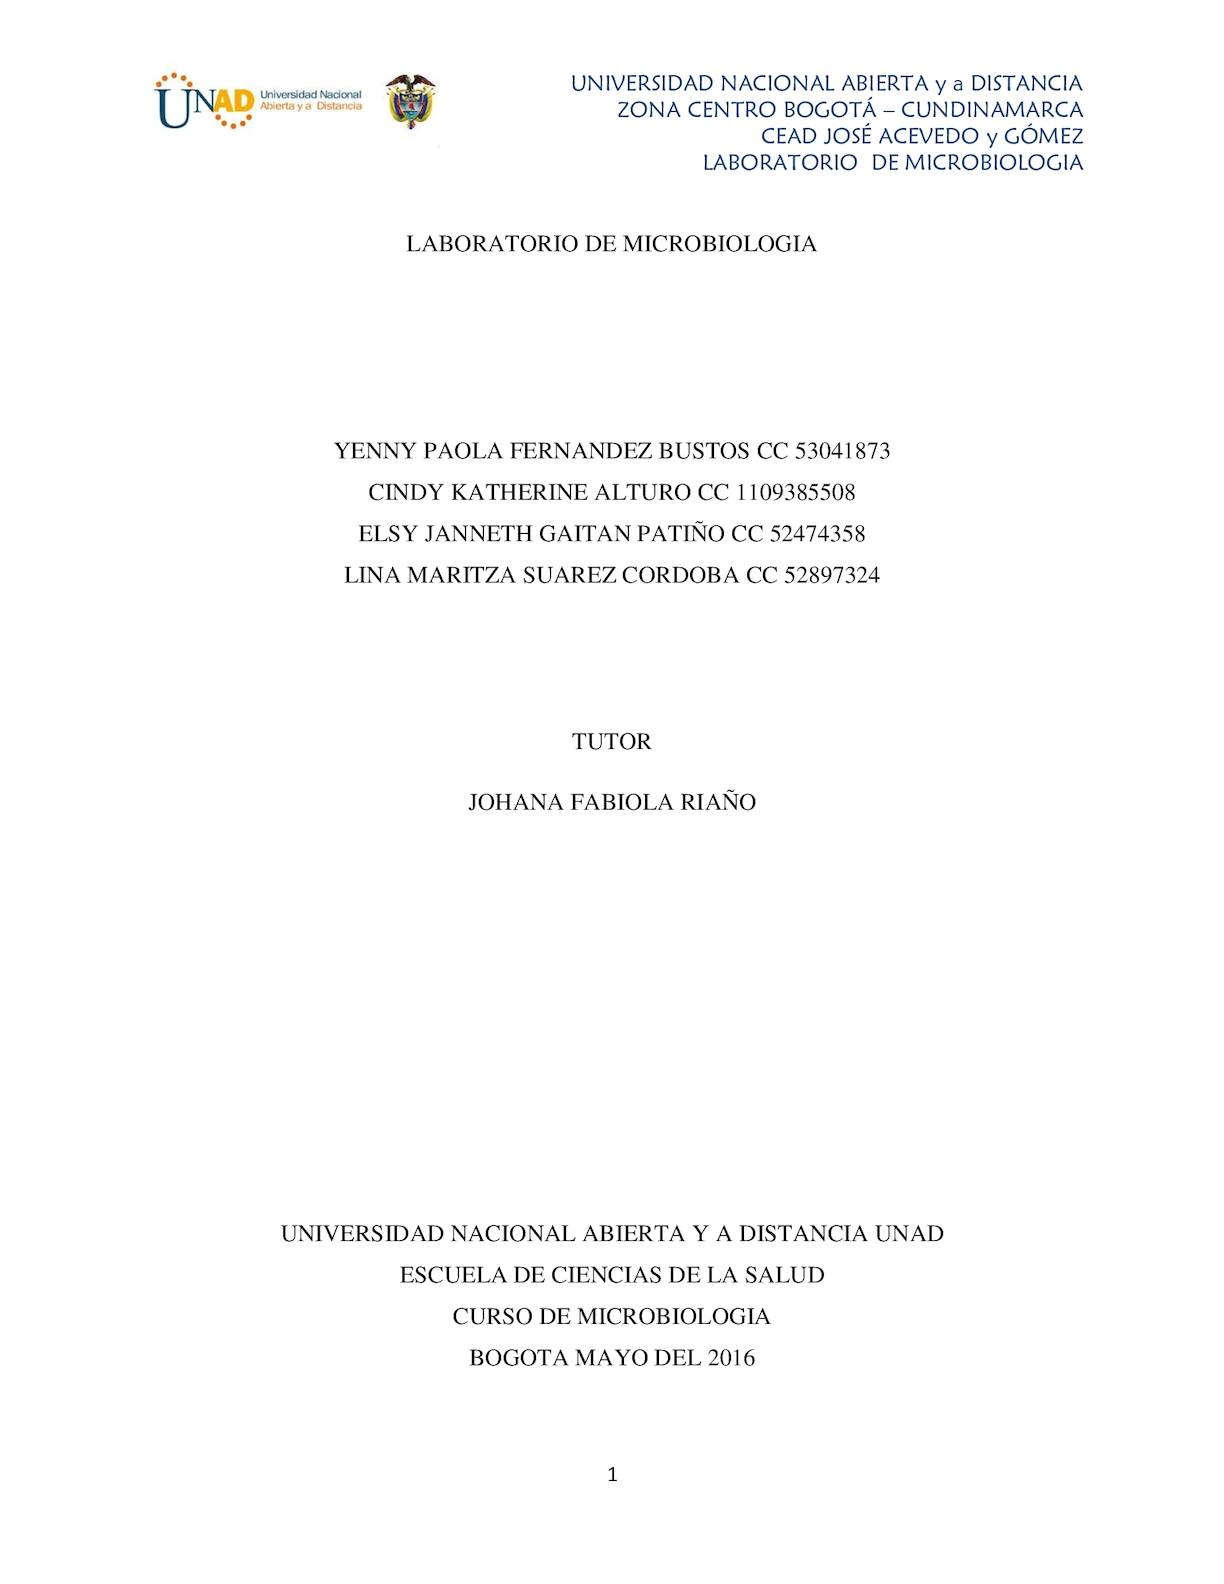 Calaméo - Informe Laboratorio Microbiologia 2 (1)final